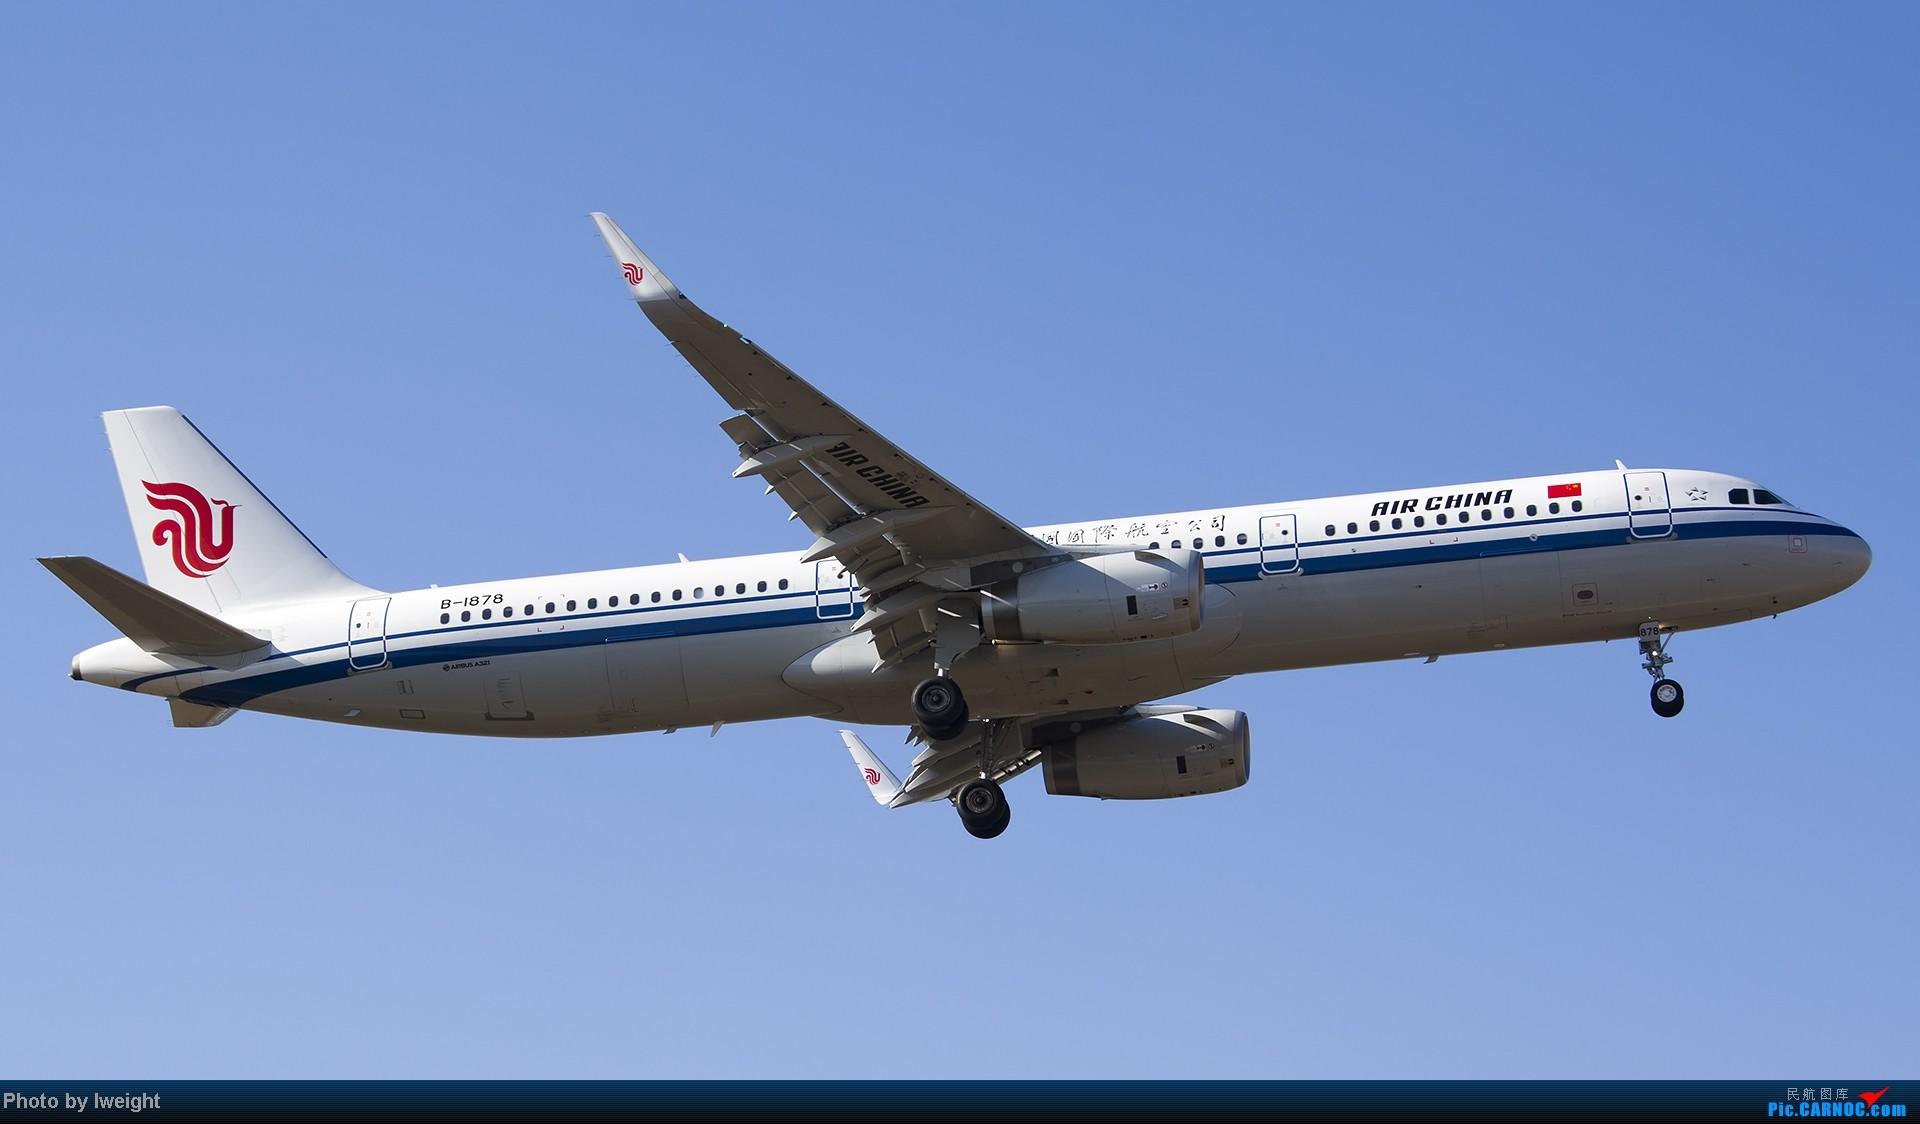 Re:[原创]抓住APEC蓝的尾巴,再拍上一组 AIRBUS A321-200 B-1878 中国北京首都机场